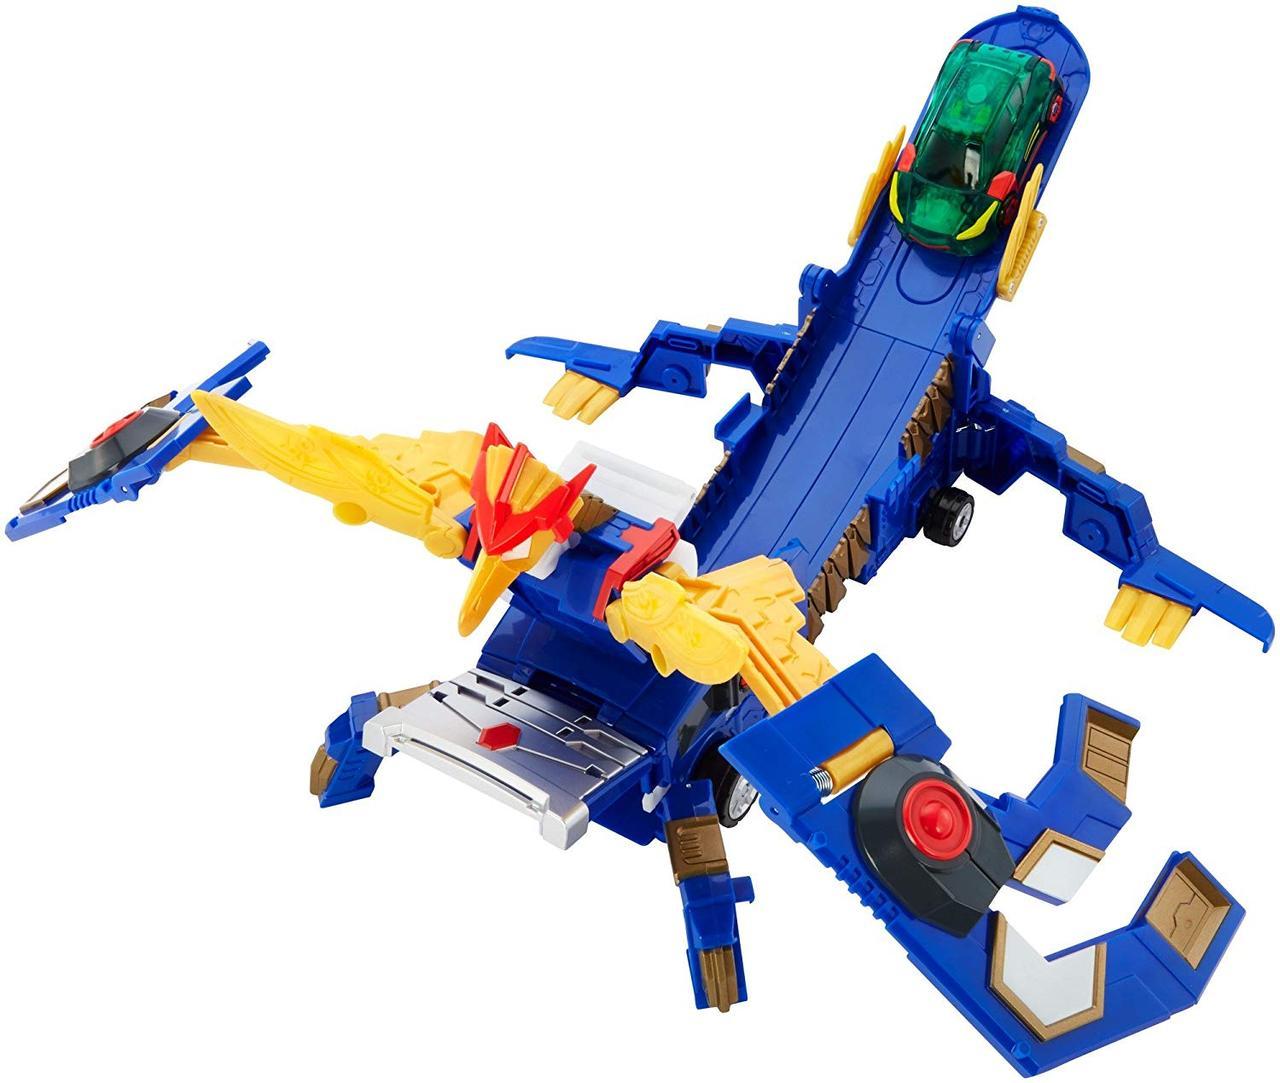 Машинка-трансформер Мекард Мега Торрикс Mecard Mega Torrix Figure, Mattel. Оригинал из США